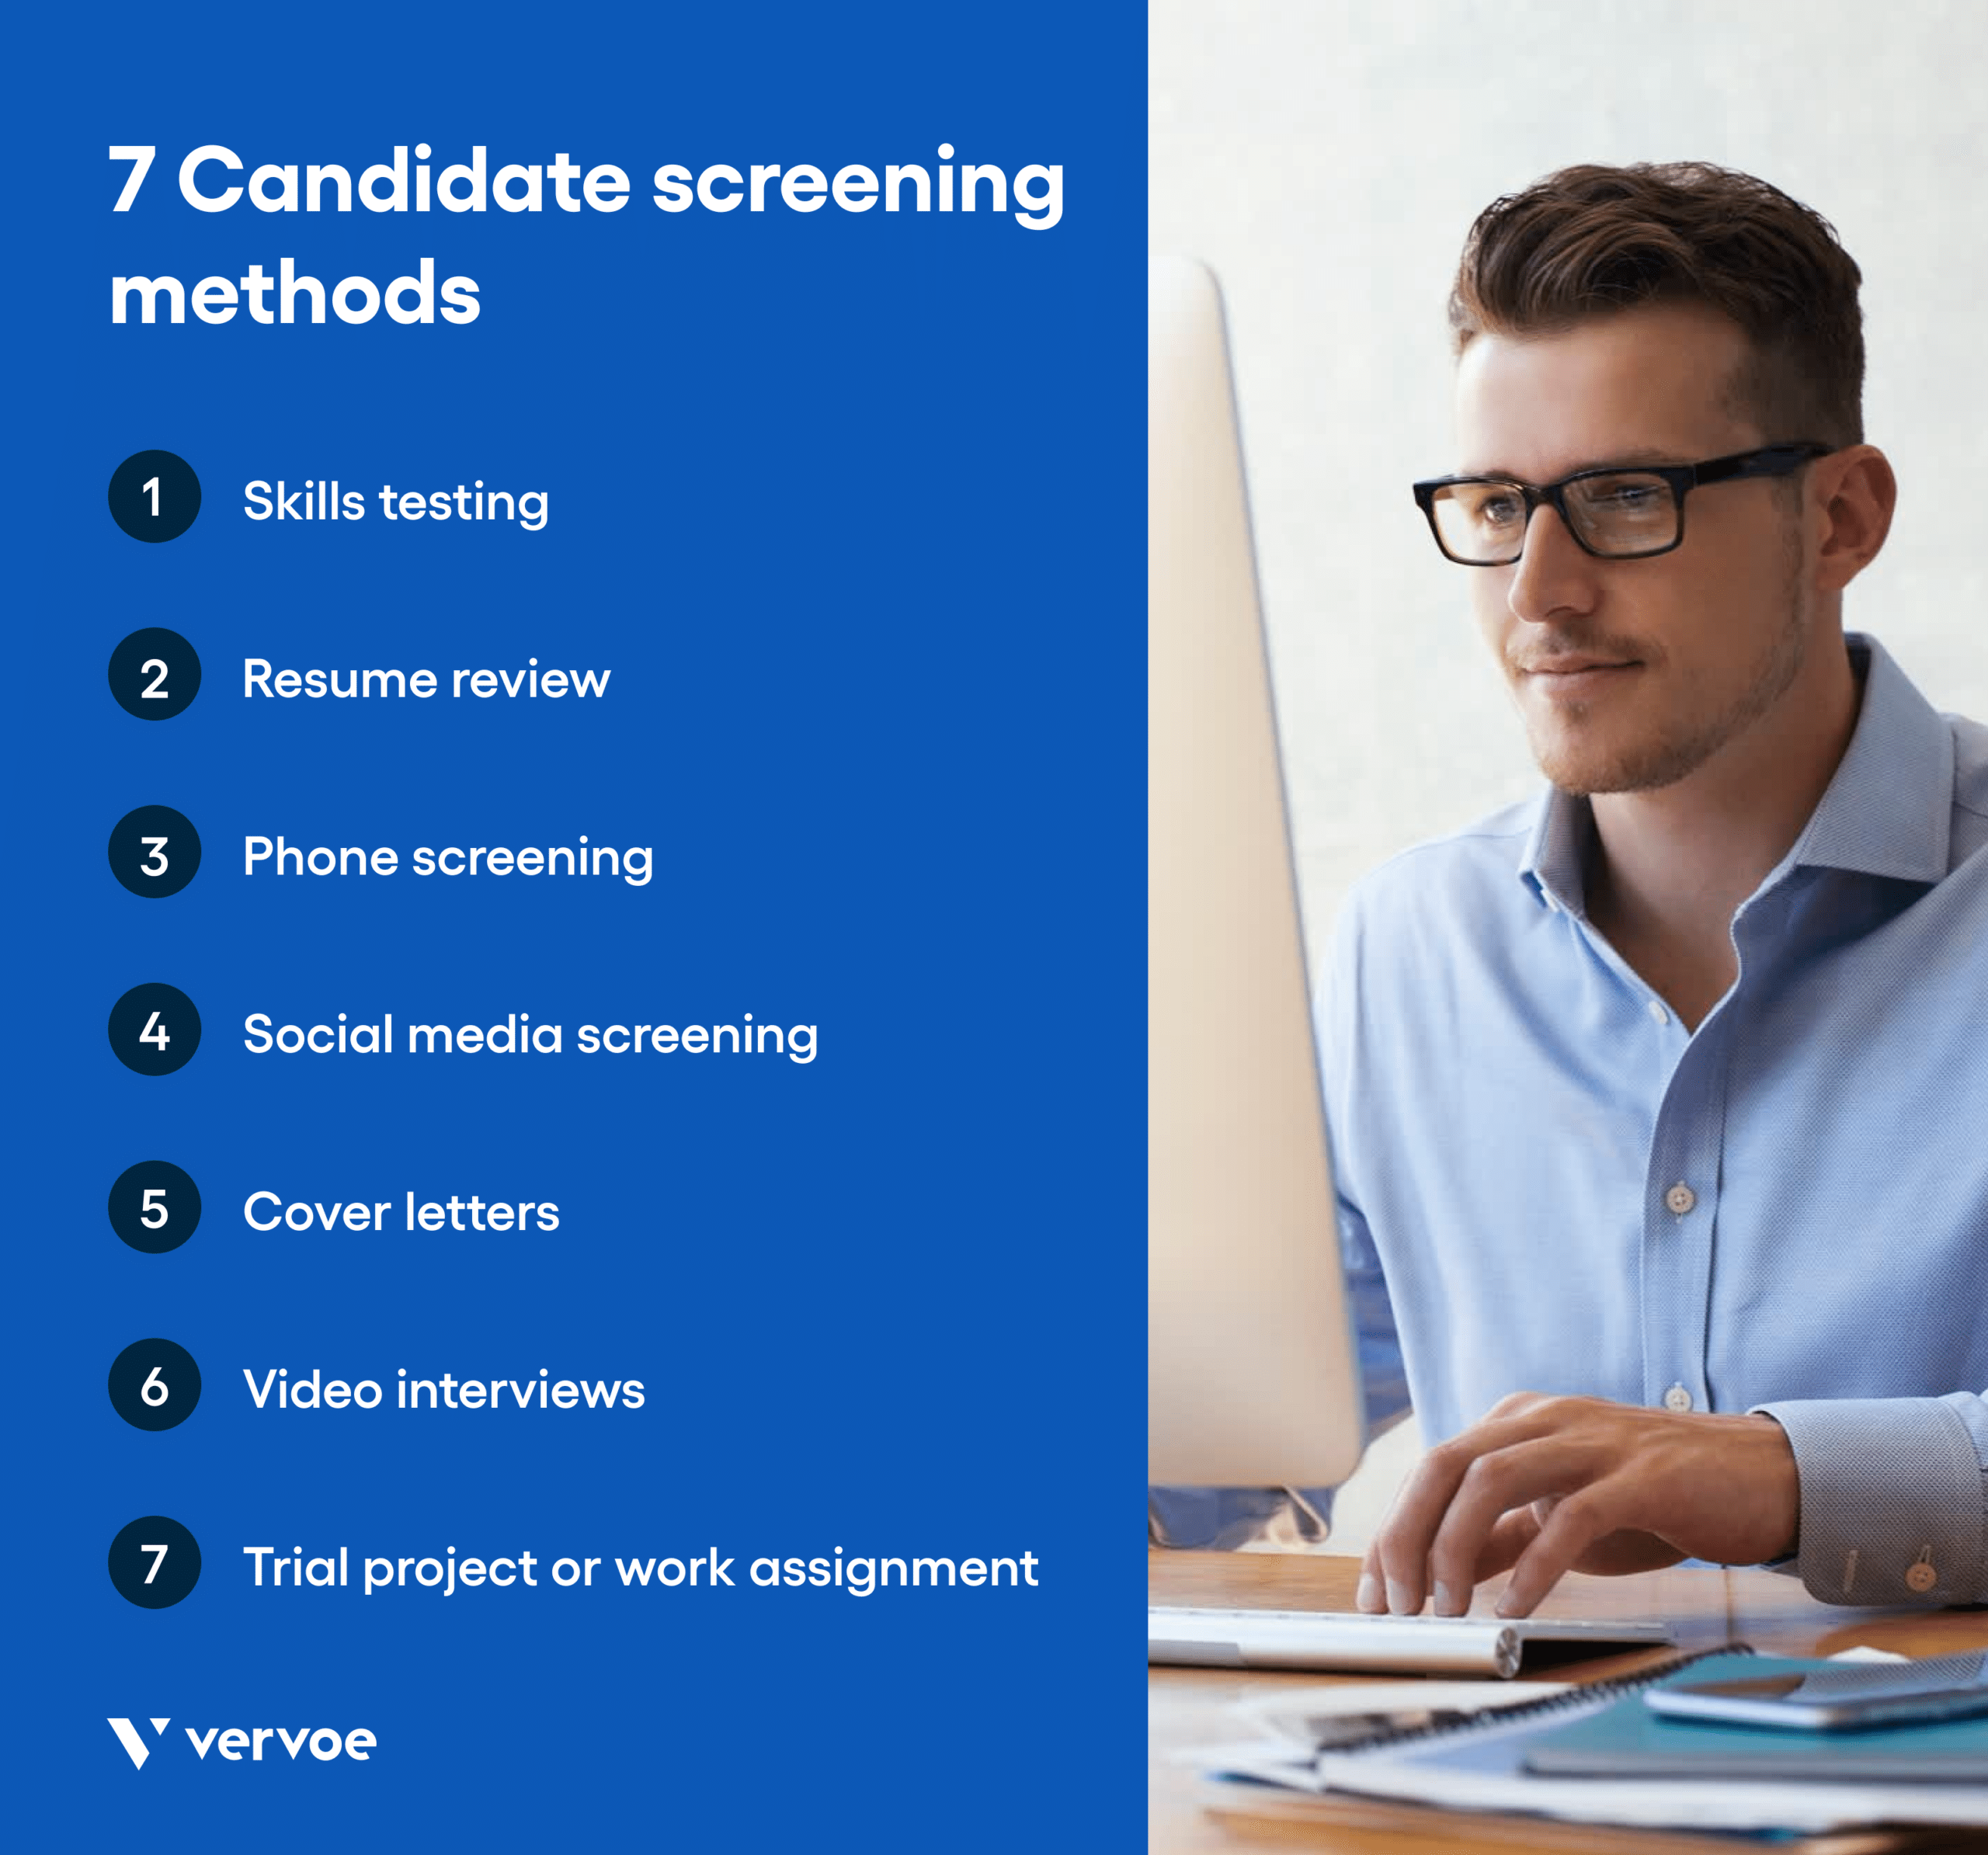 7 candidate screening methods